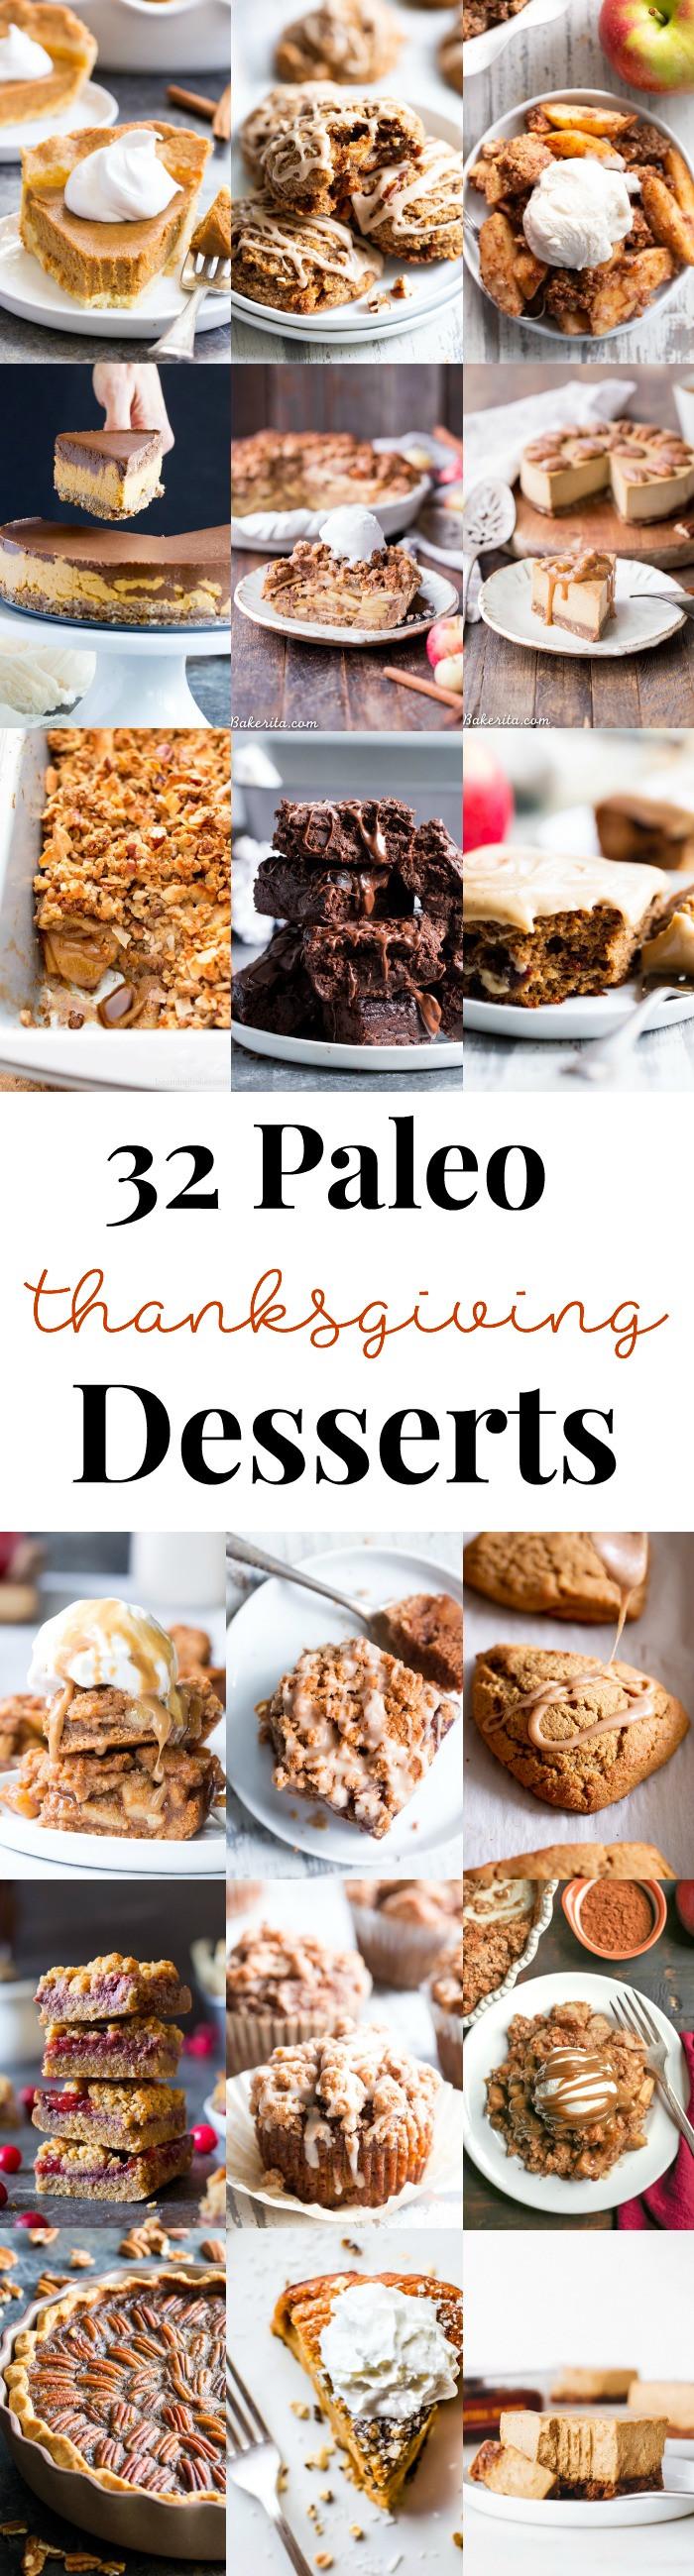 Paleo Thanksgiving Dessert  32 Paleo Thanksgiving Desserts